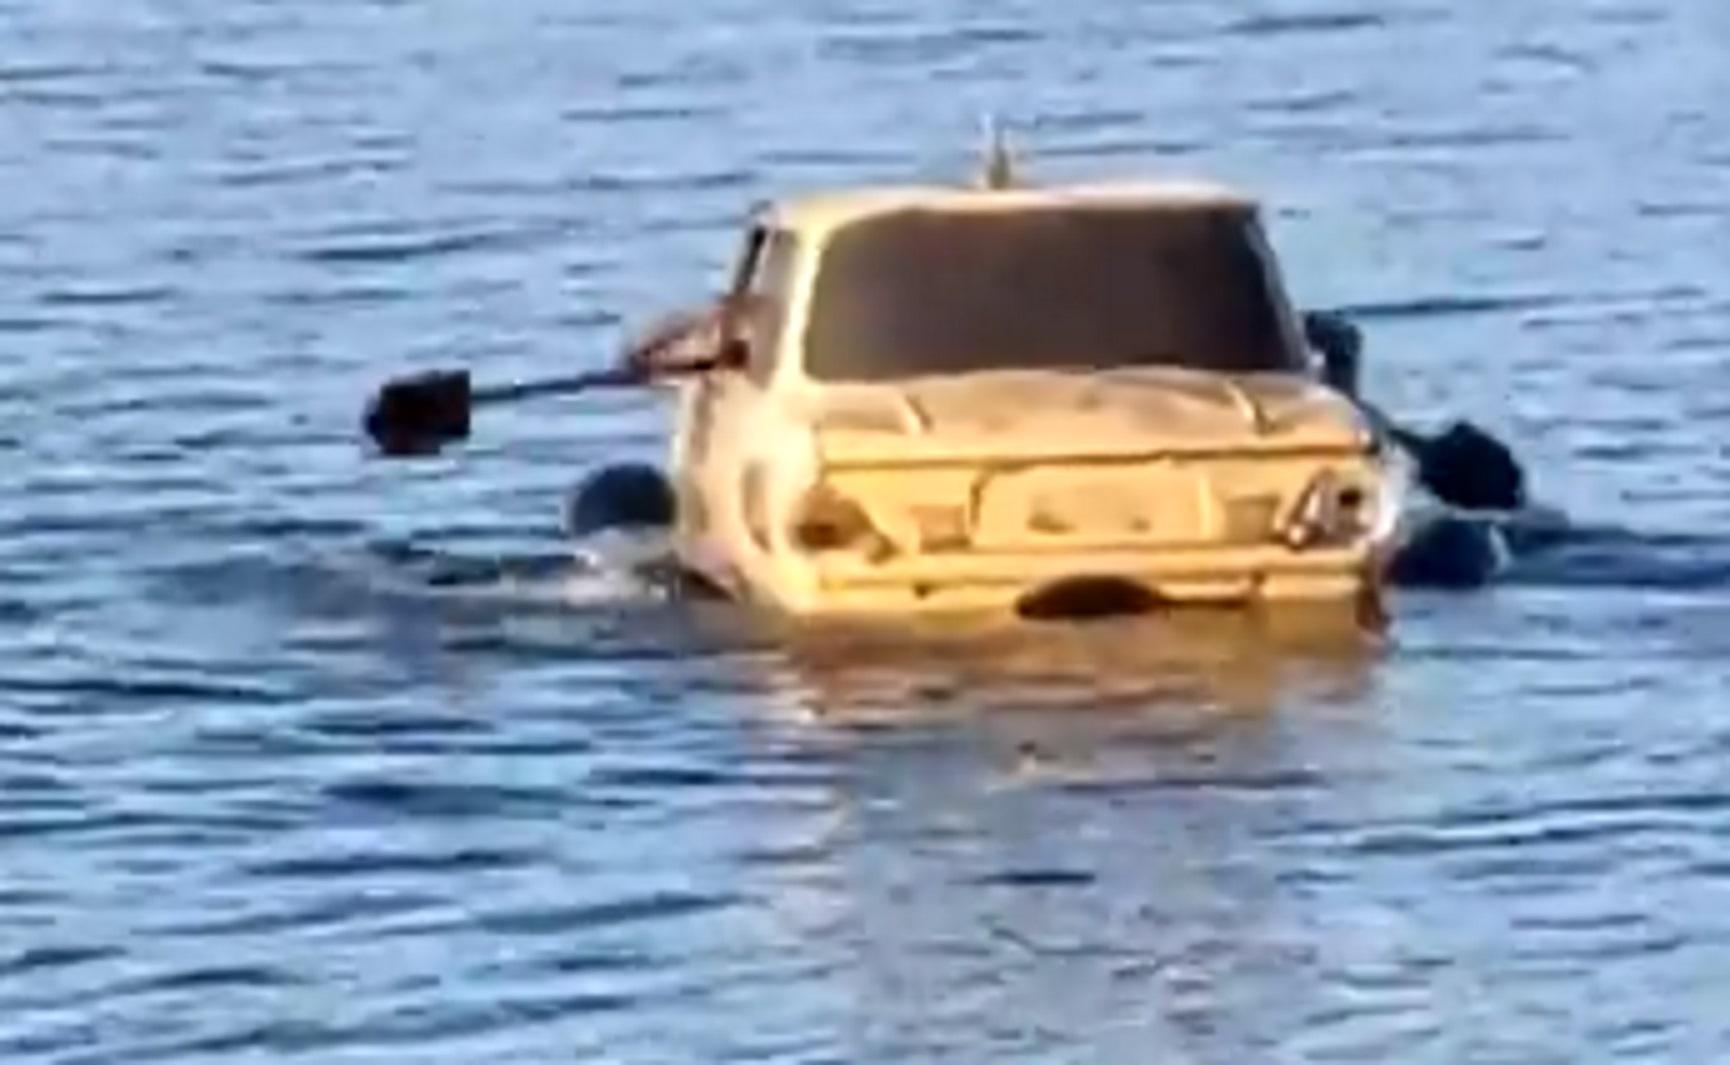 Надводная лодка «Запорожец». В Донецке через озеро переправлялись на автомобиле